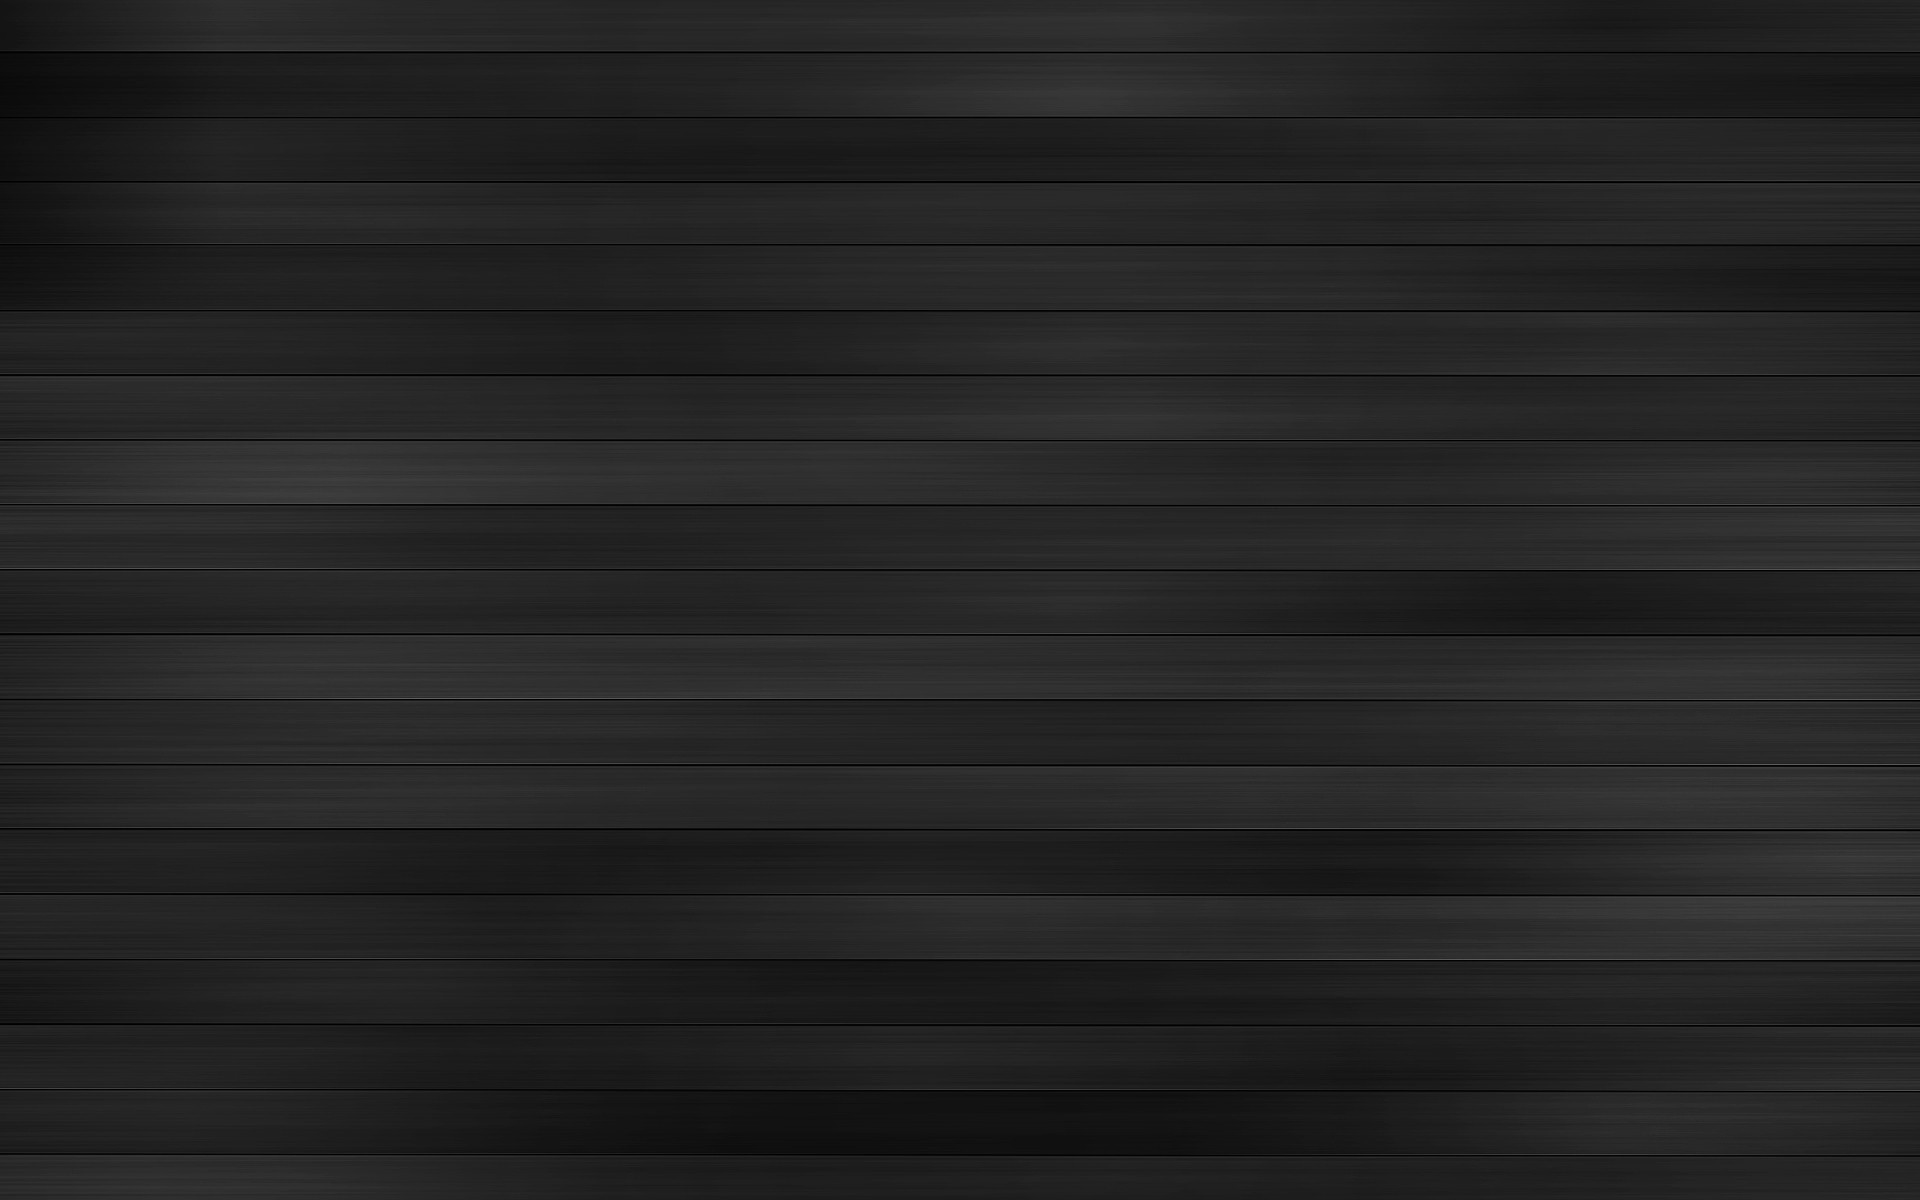 Solid Black Black Wood Black I WALL FREE 1920×1200